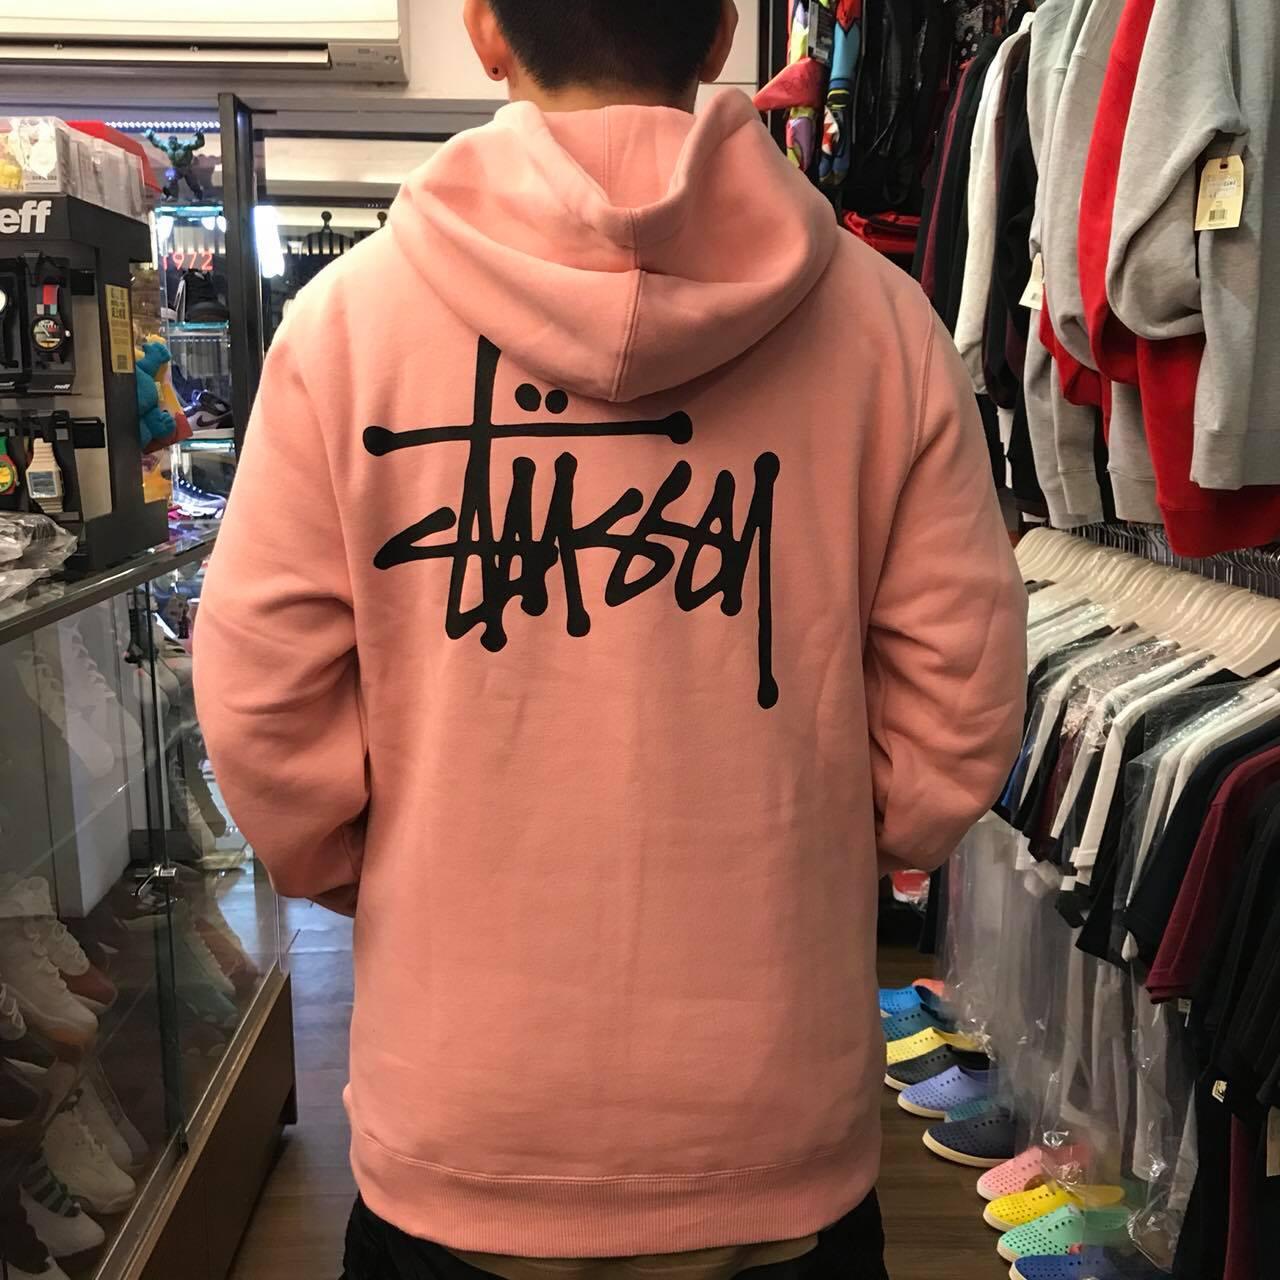 BEETLE 現貨 STUSSY BASIC HOODY 粉紅 黑 草寫 文字LOGO 連身帽T ST-49